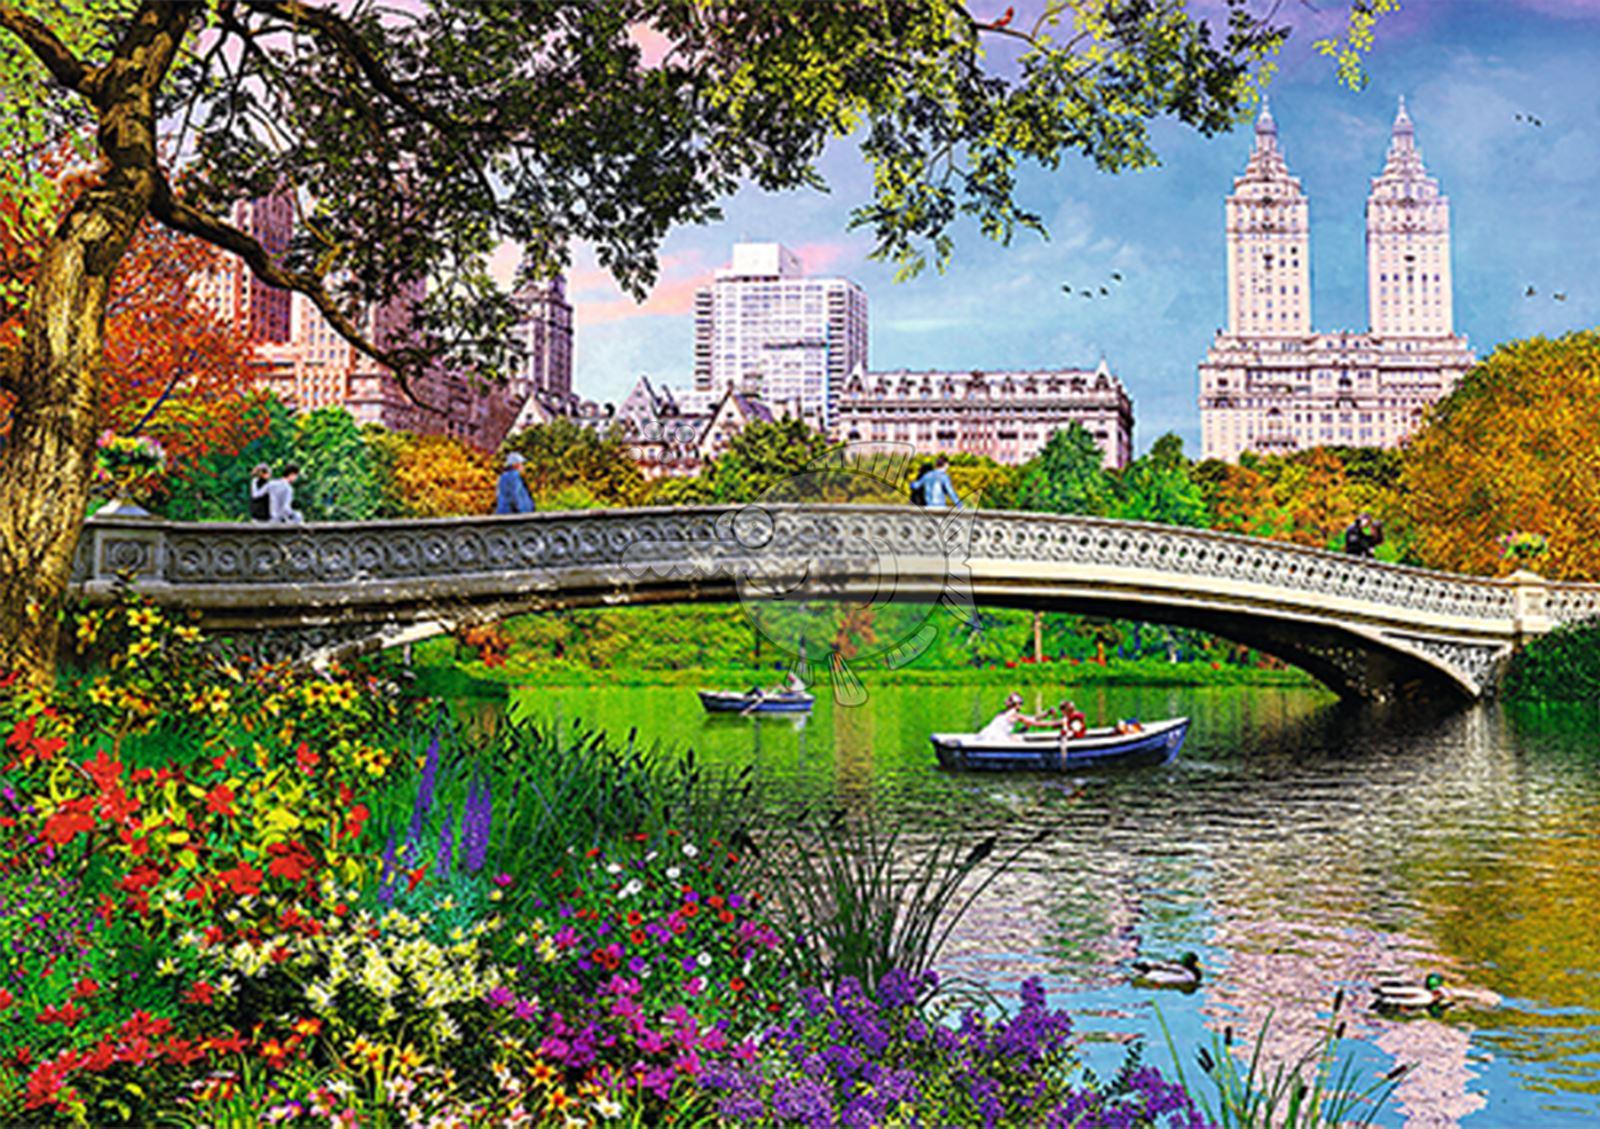 Trefl-300-500-1000-1500-2000-3000-4000-6000-Piece-Jigsaw-Puzzle-Landscapes-City thumbnail 66